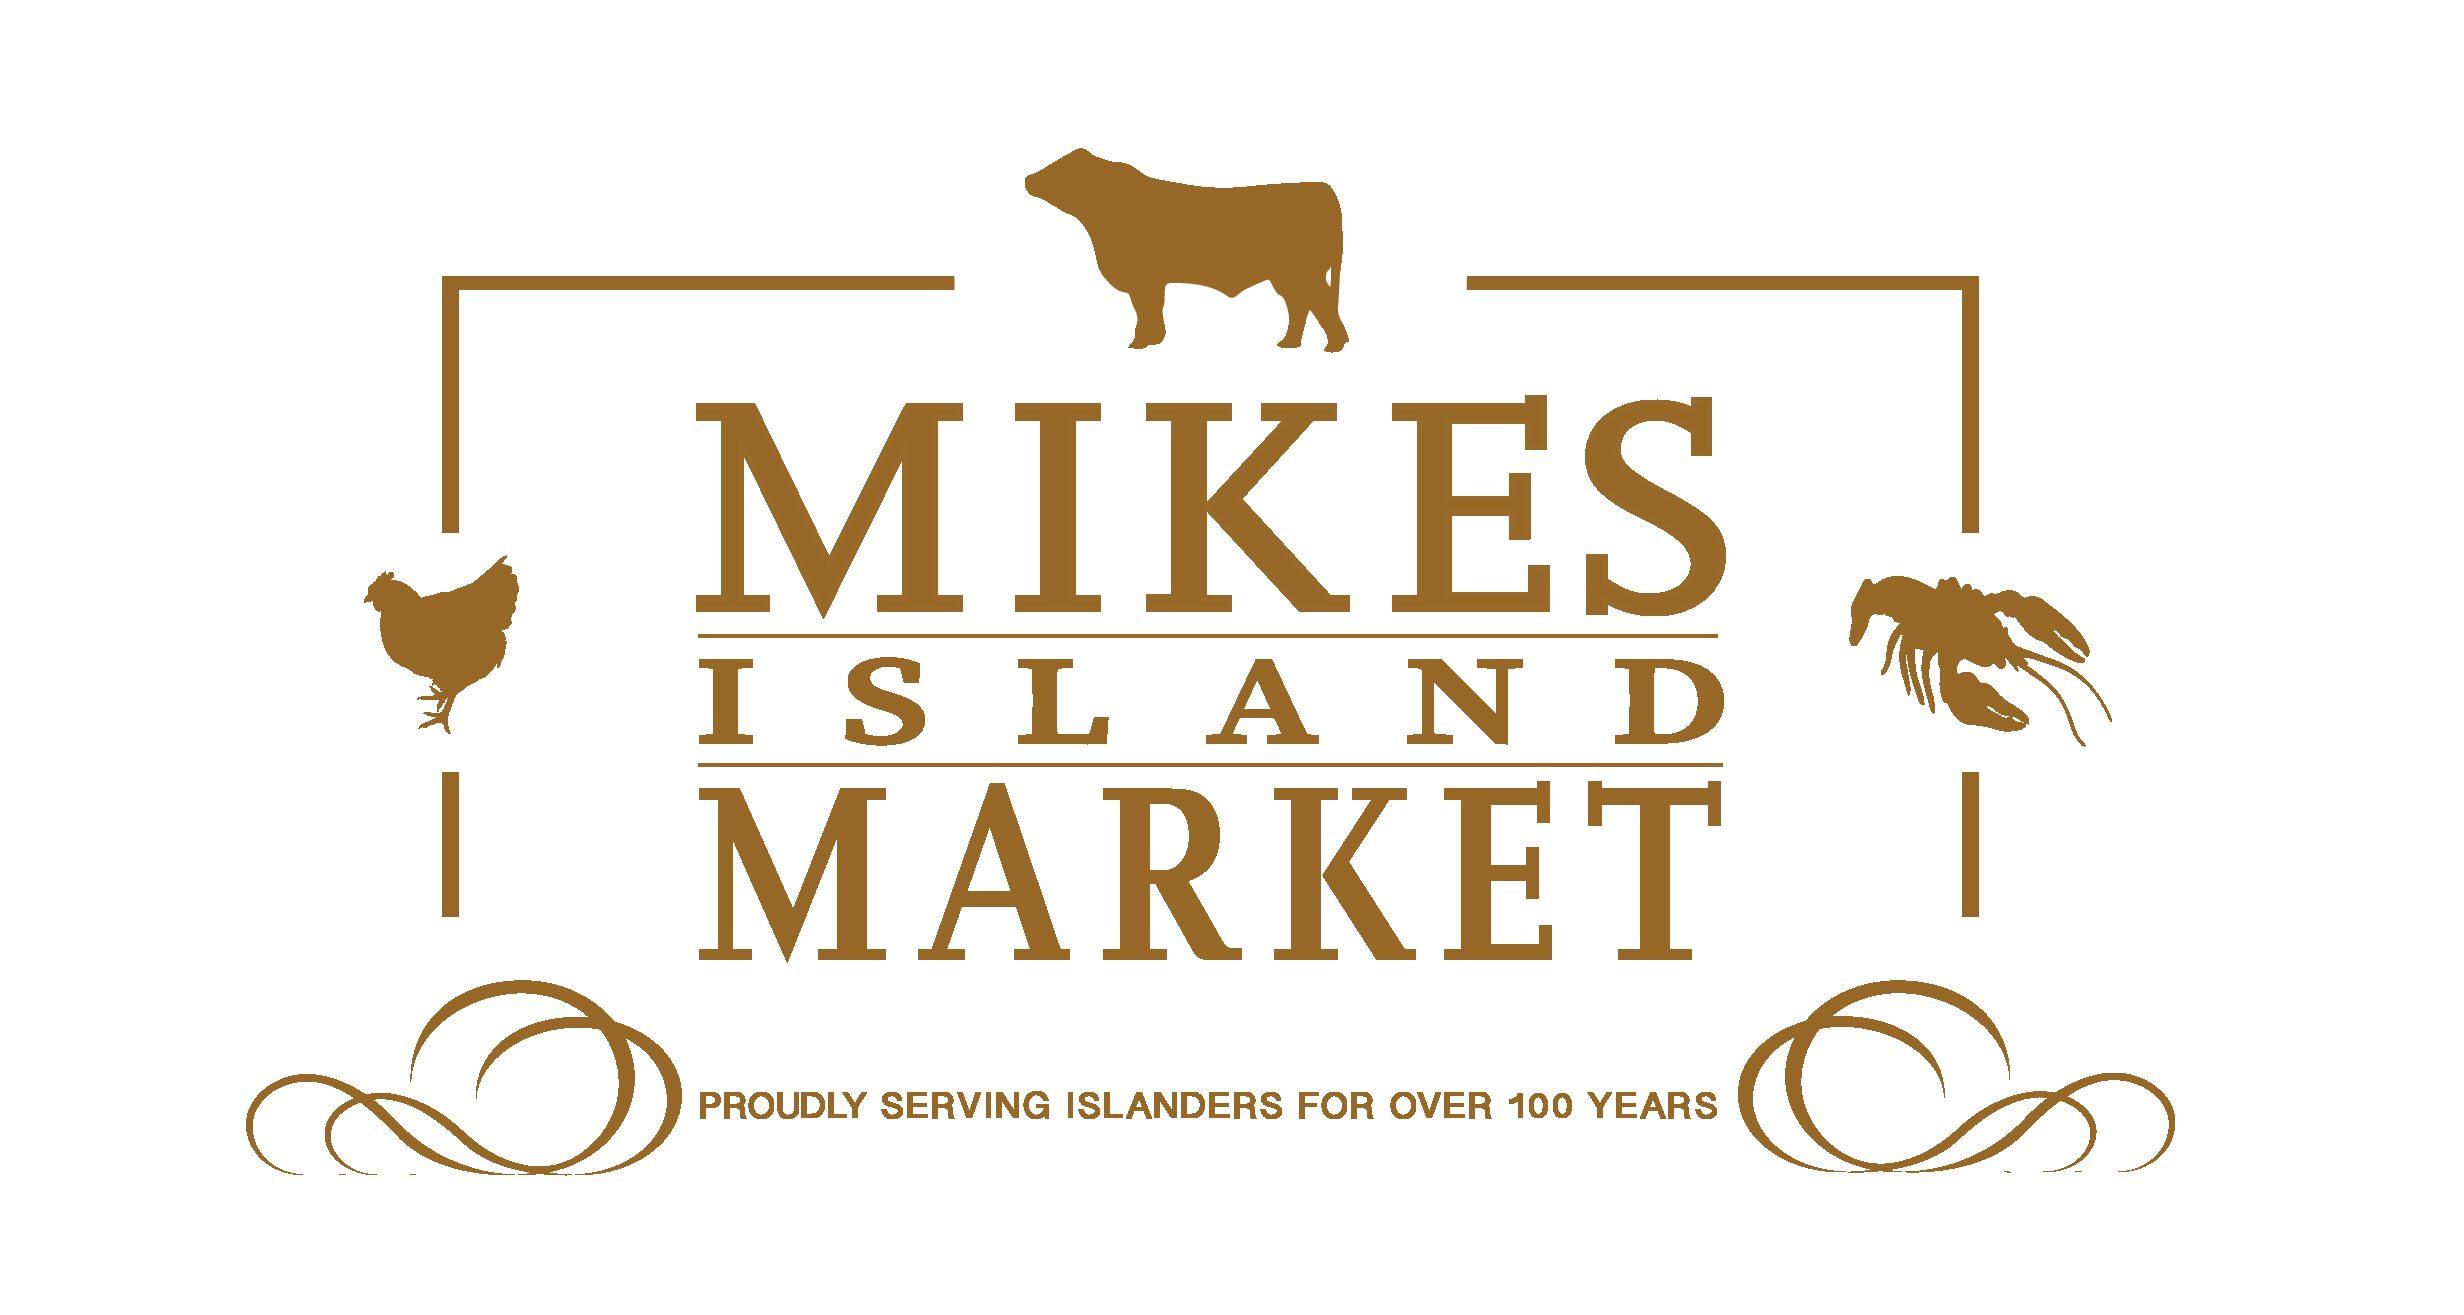 Mikes Island Market